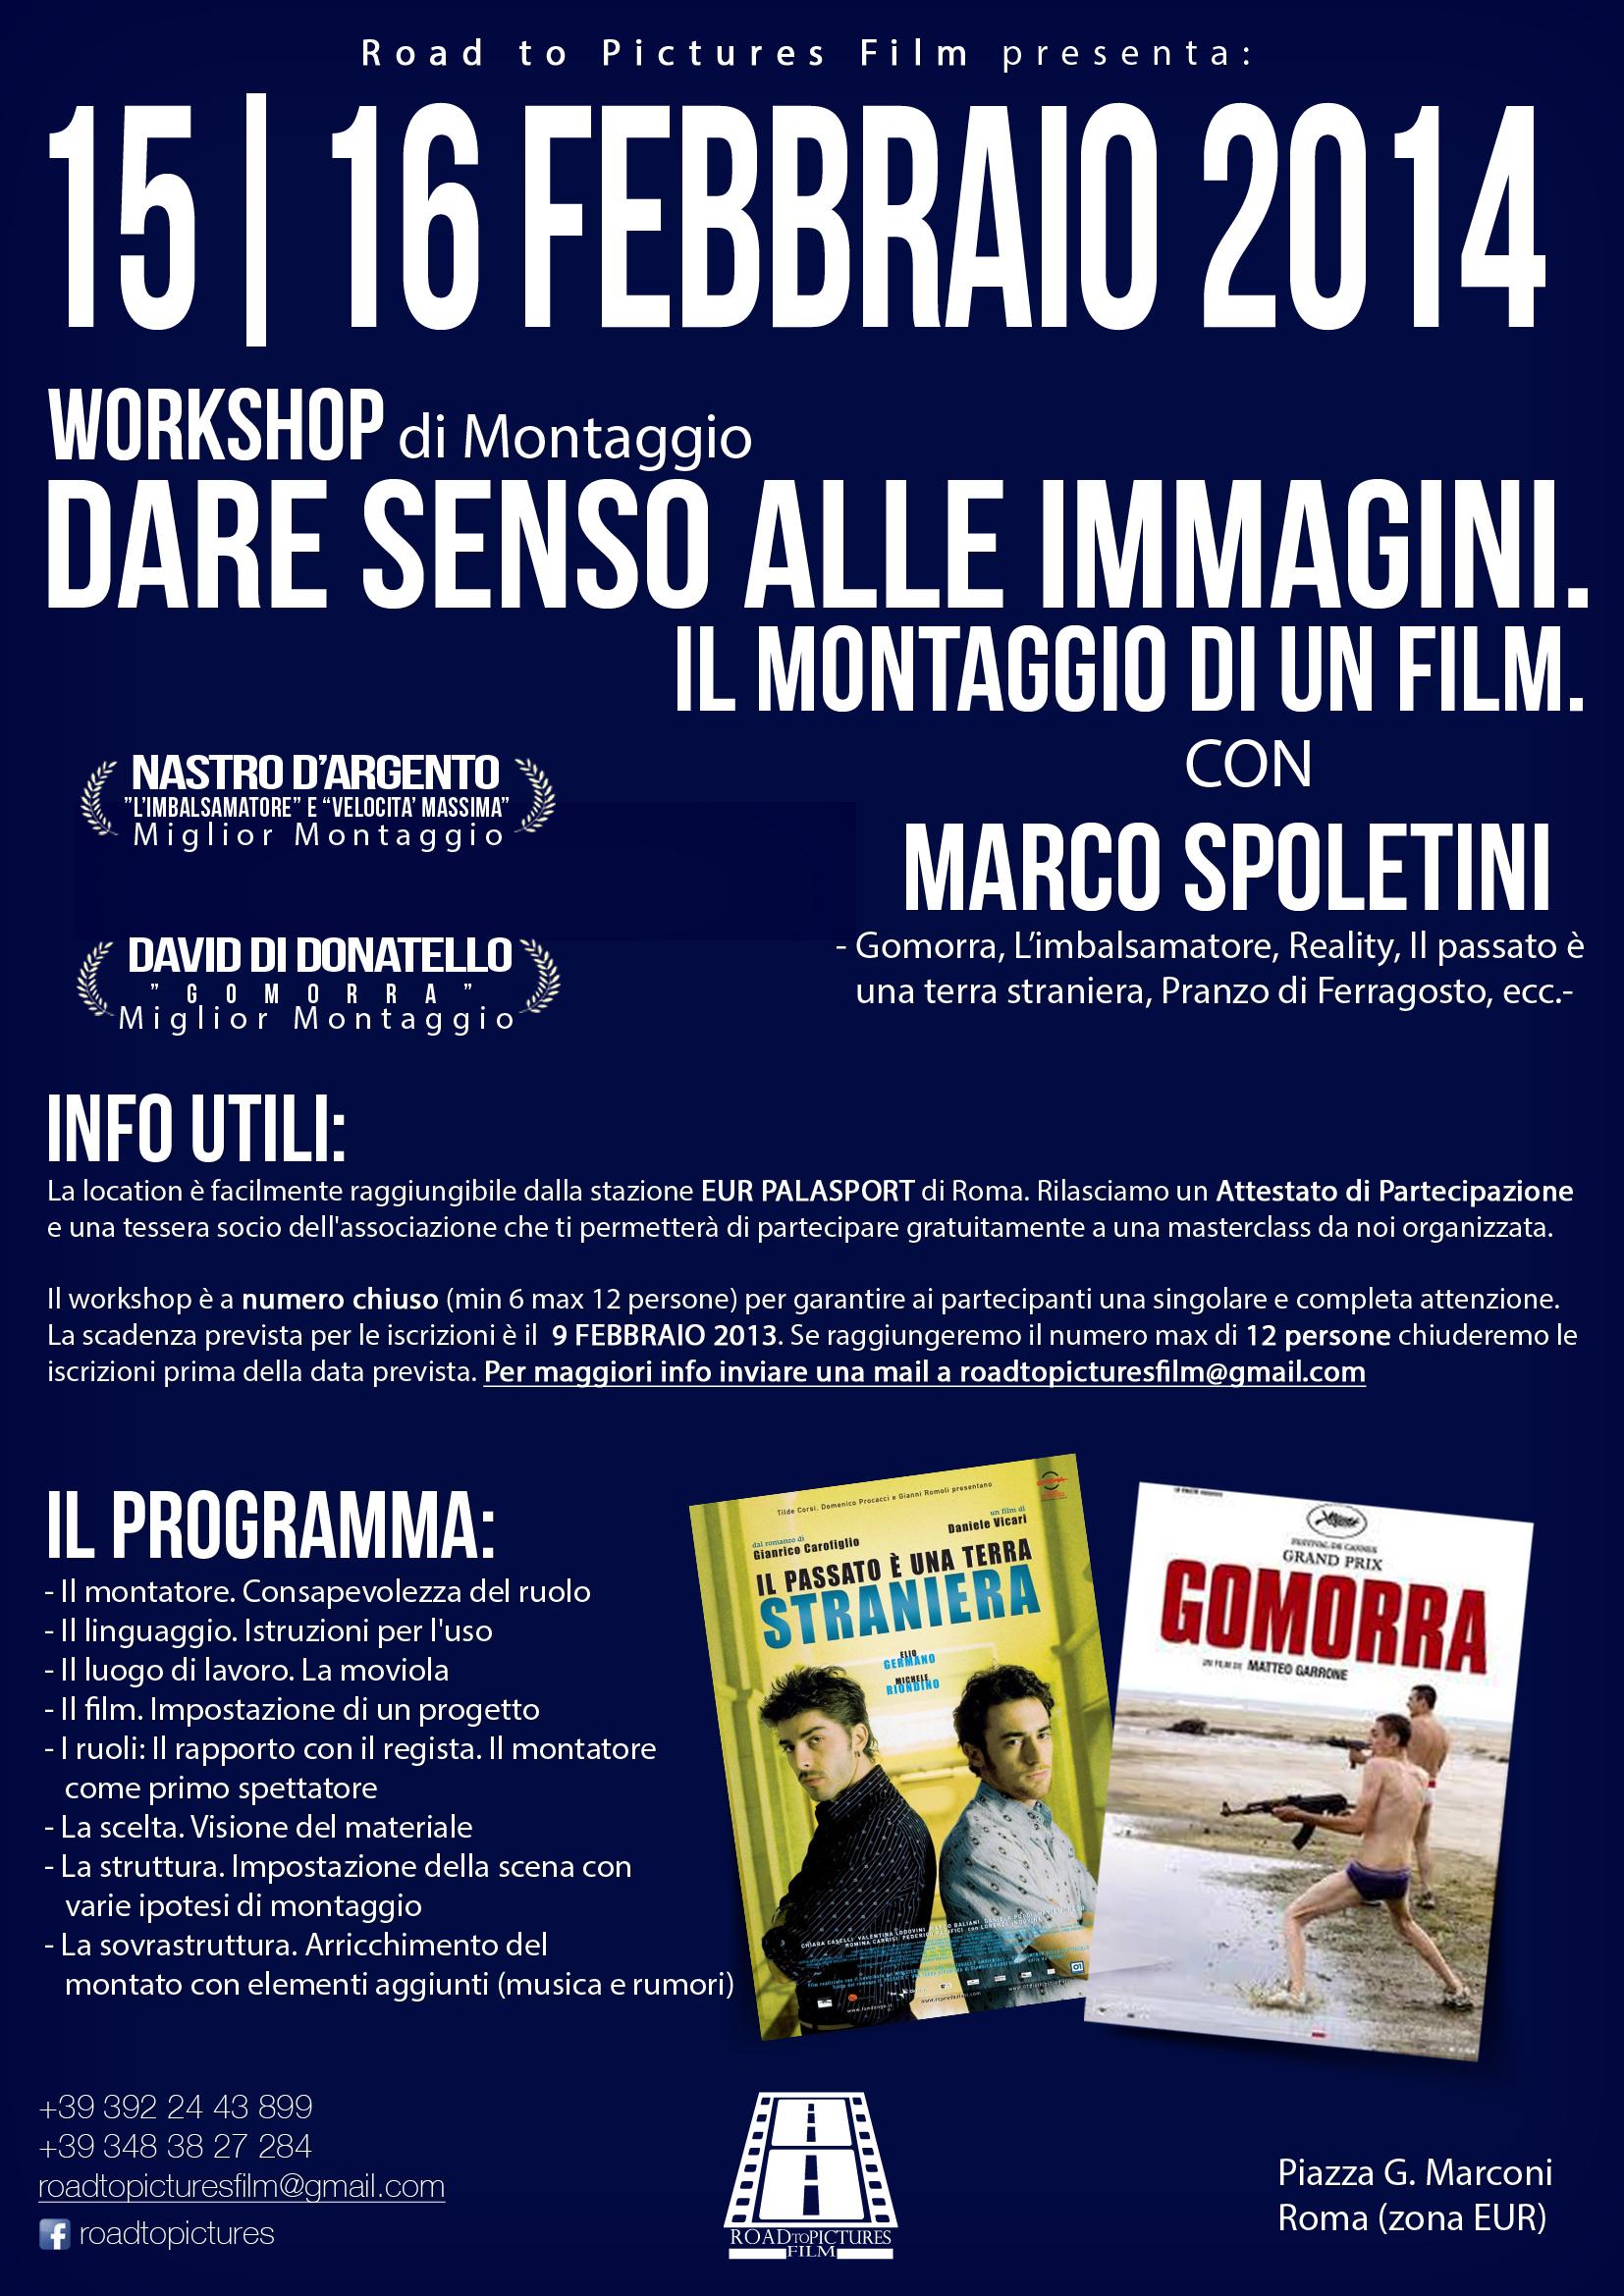 marco spoletini workshop